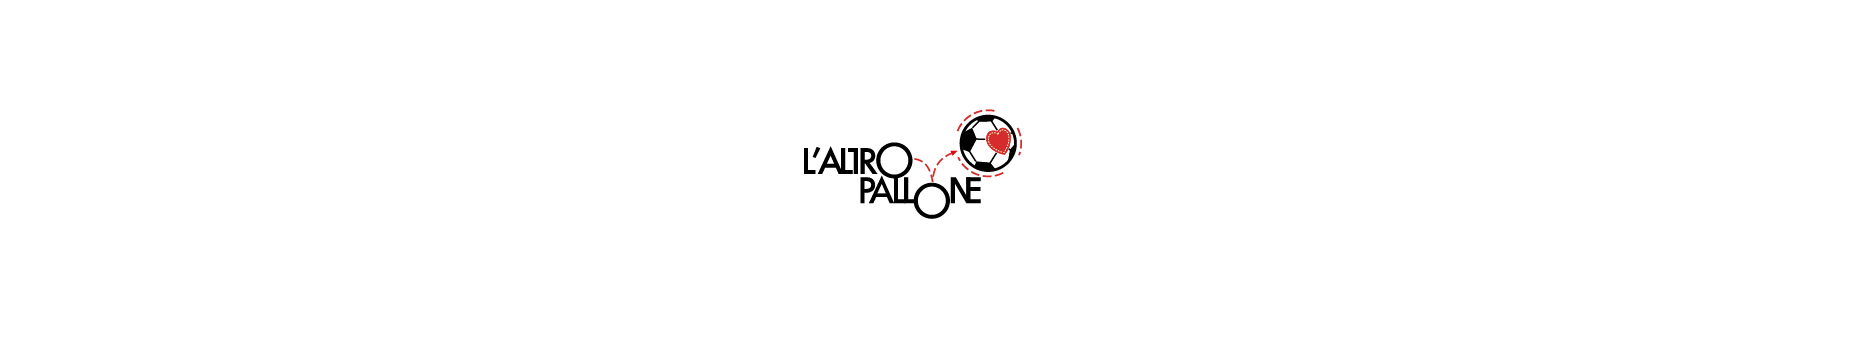 associazione Altropallone ASD ONLUS logo